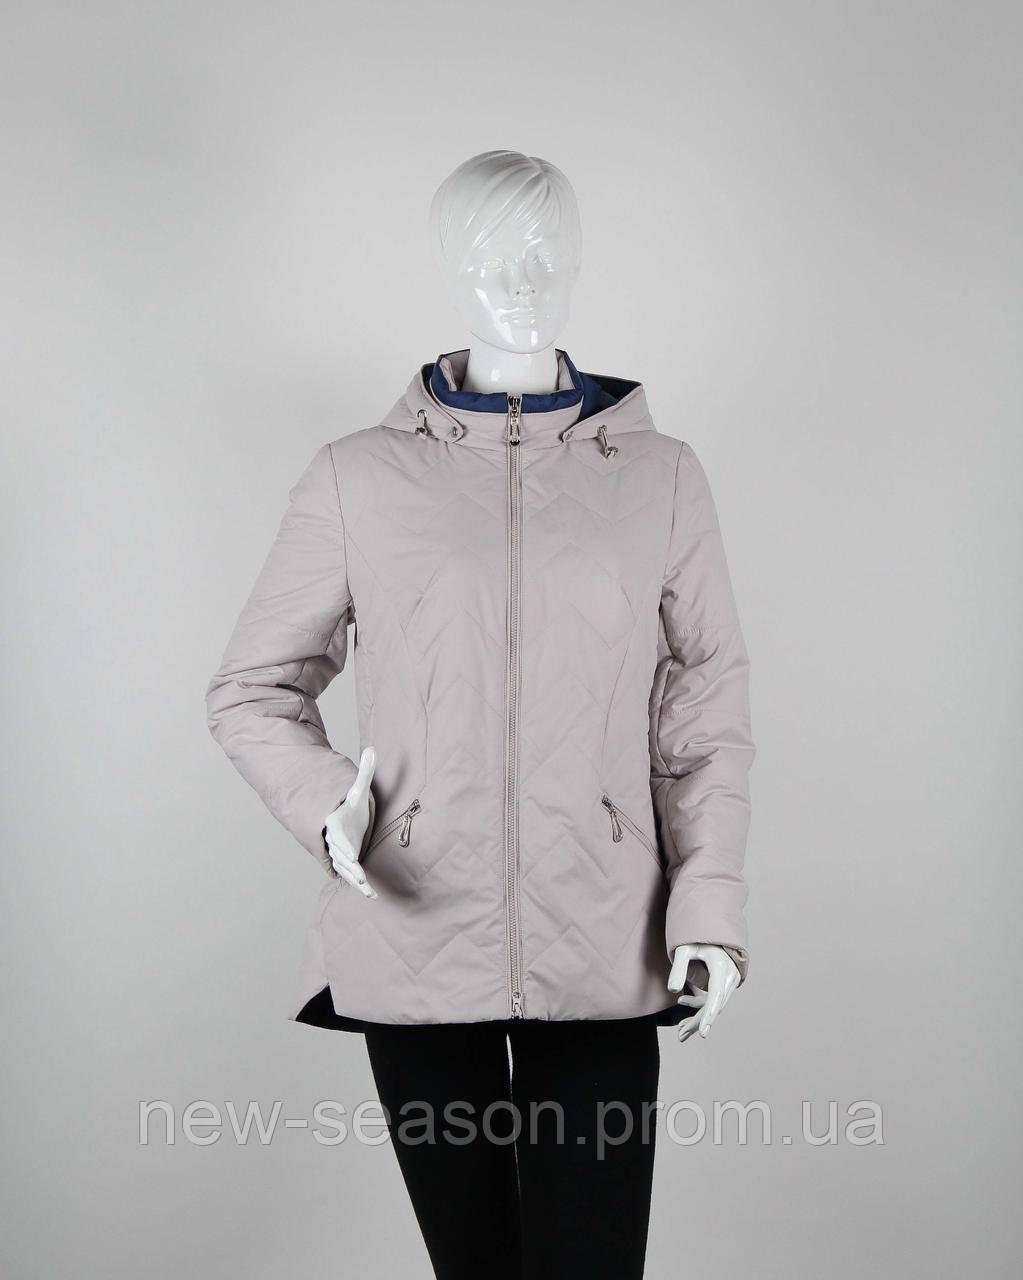 Куртка демисезонная Origa Рената пломбир василек